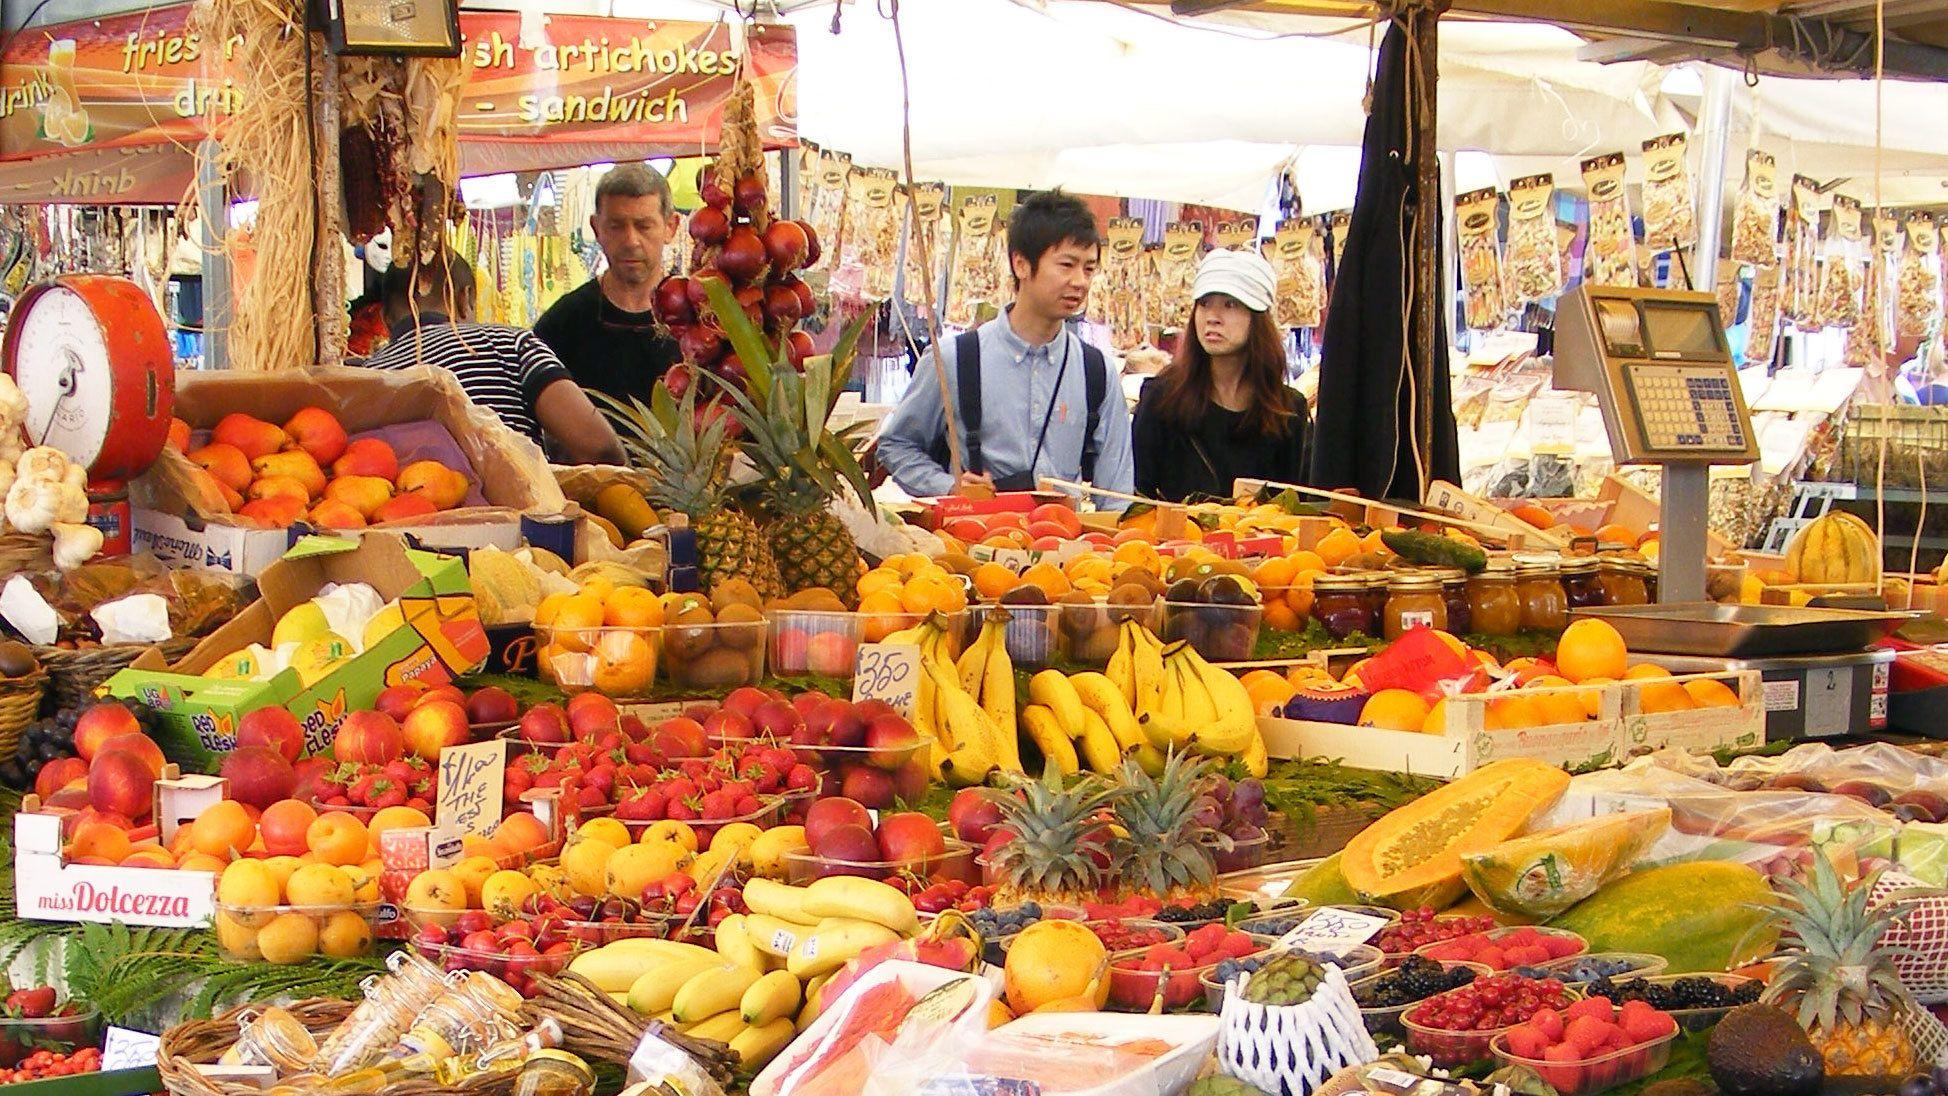 Couple tourists strolling through the food market at Campo de Fiori.